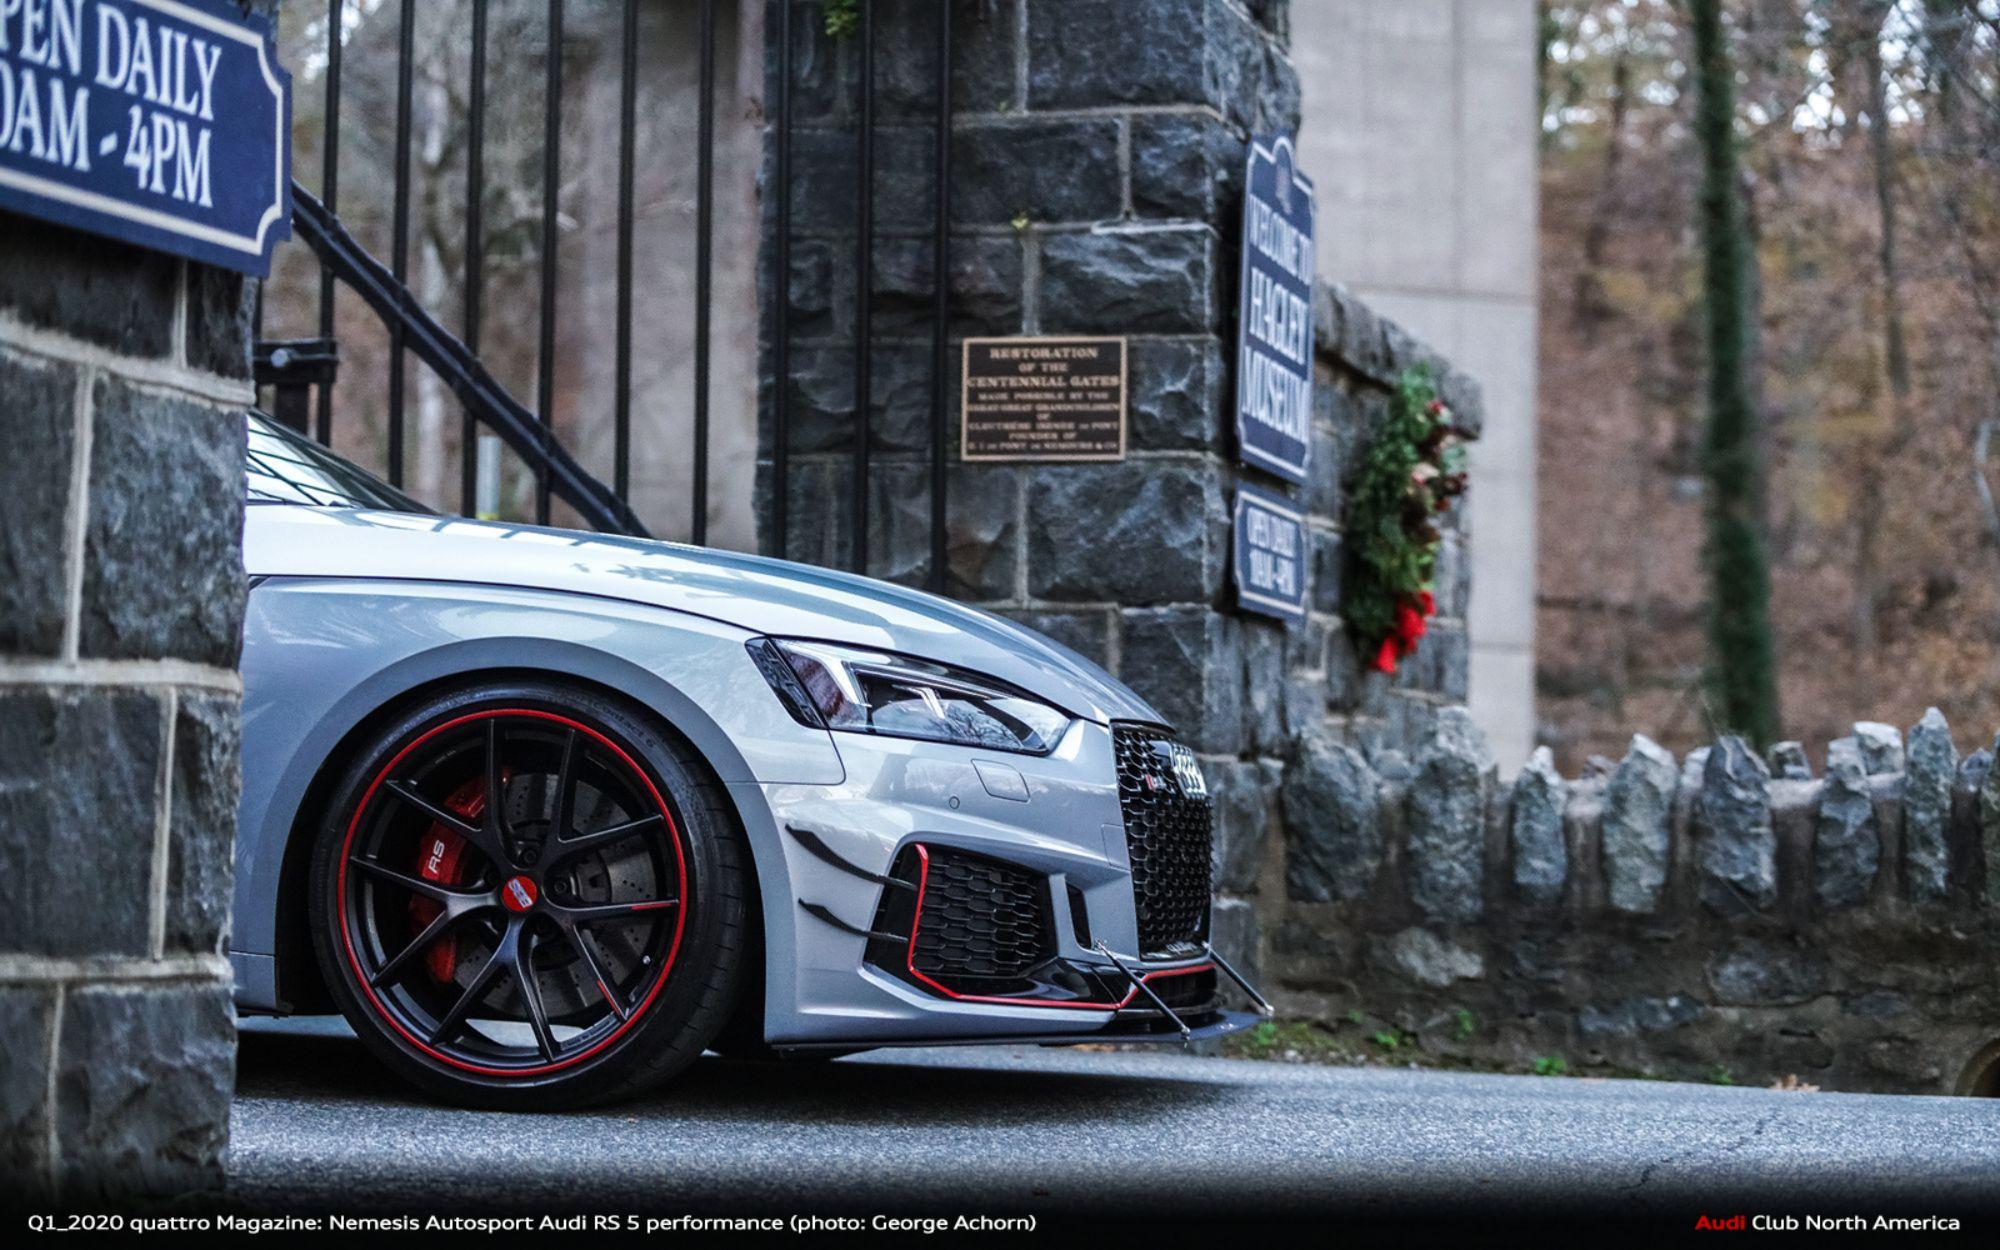 Q1_2020 quattro Magazine Feature: Nemesis Autosport Audi RS 5 performance at a Crossroads